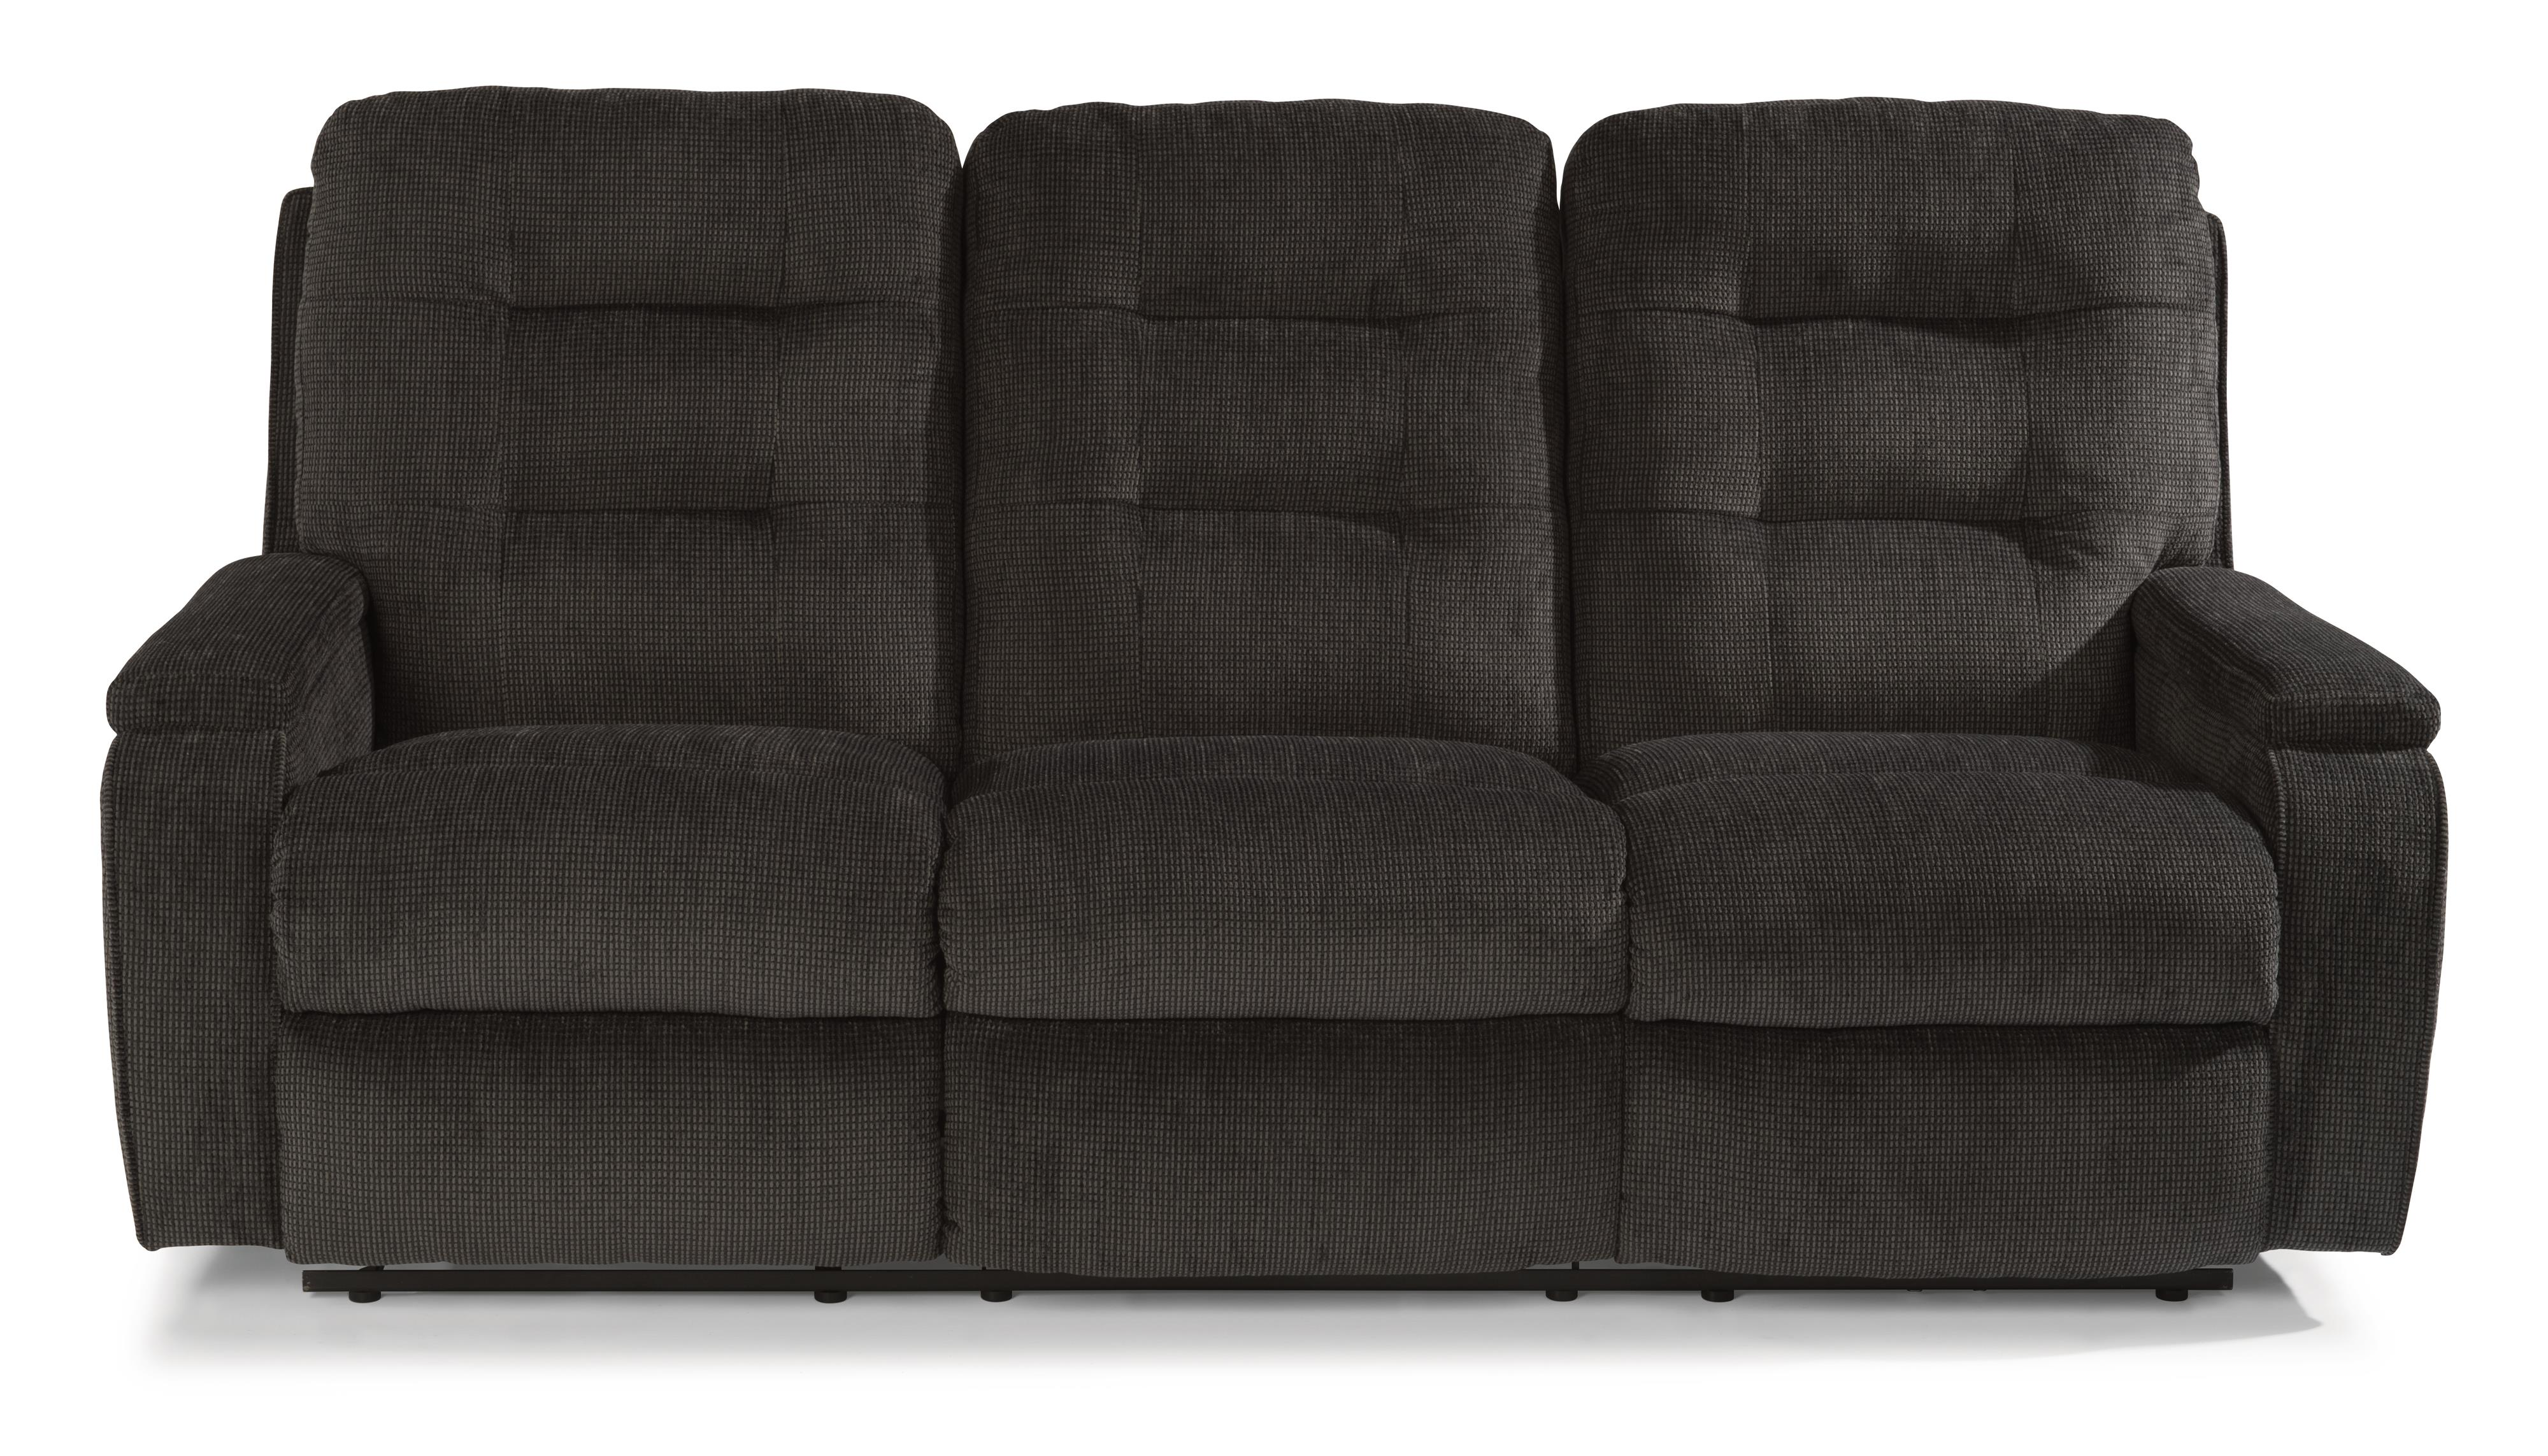 Flexsteel Kerrie Power Reclining Sofa - Item Number: 2806-62M-163-40